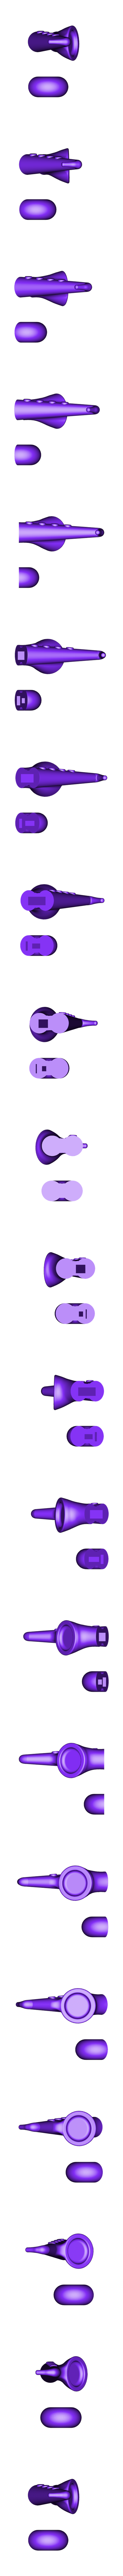 Saxo.stl Download free STL file OTG USB Saxophone Essentielb 16GB • 3D printable model, Boxplyer